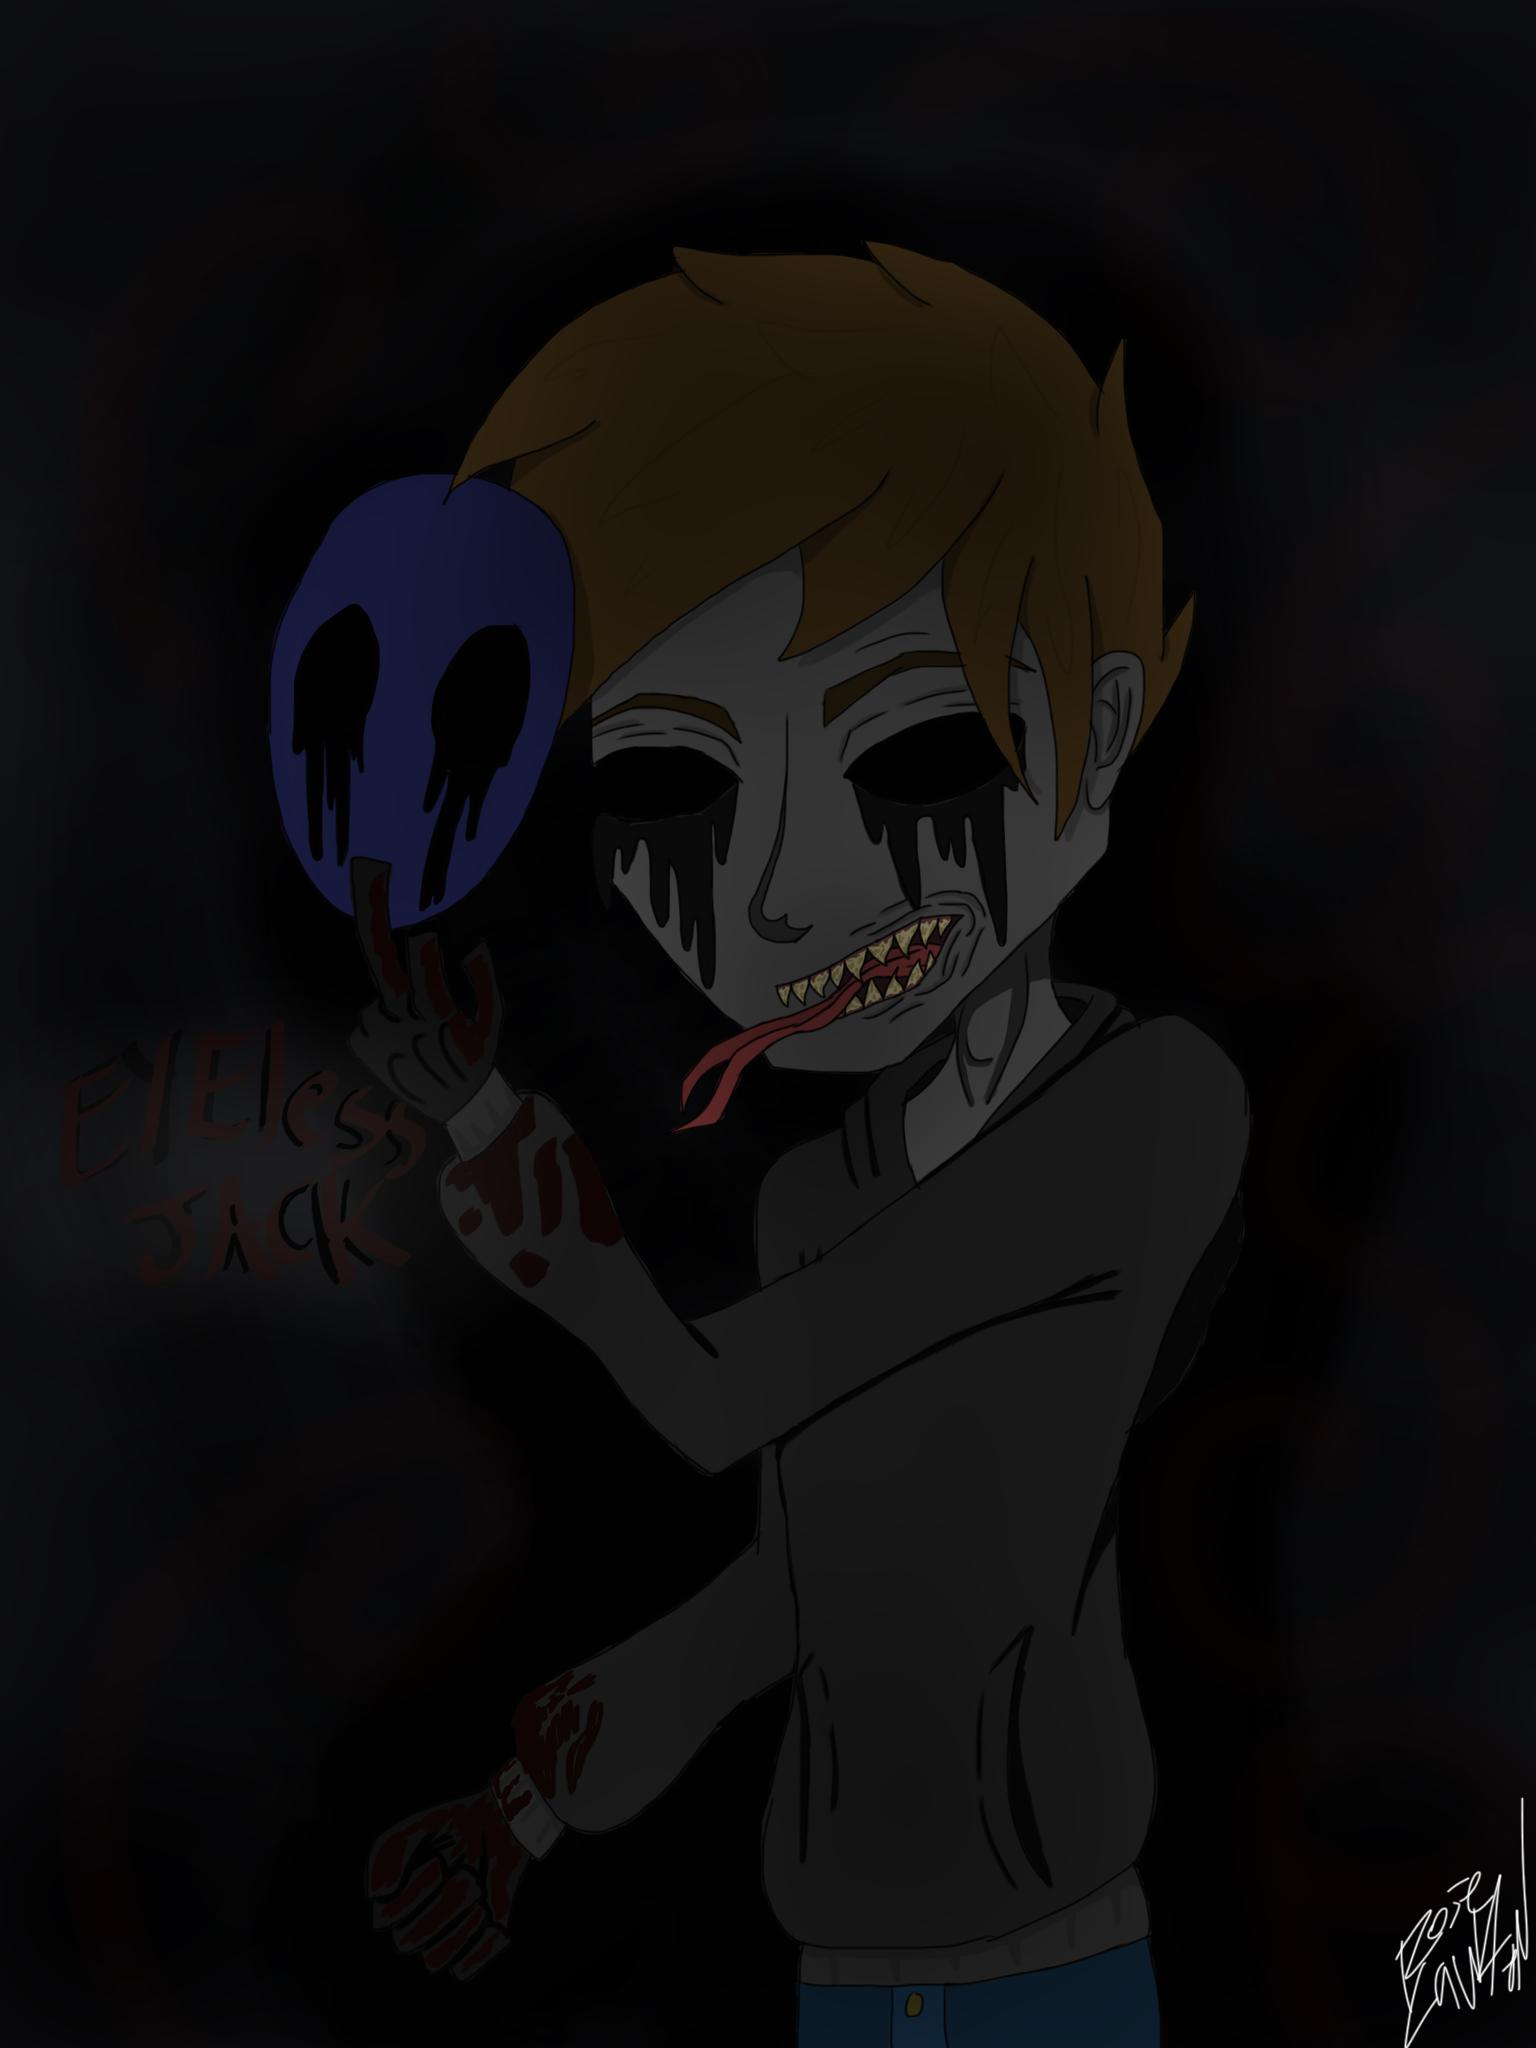 Eyeless Jack Creepypasta By Dragonbreath708 On DeviantArt